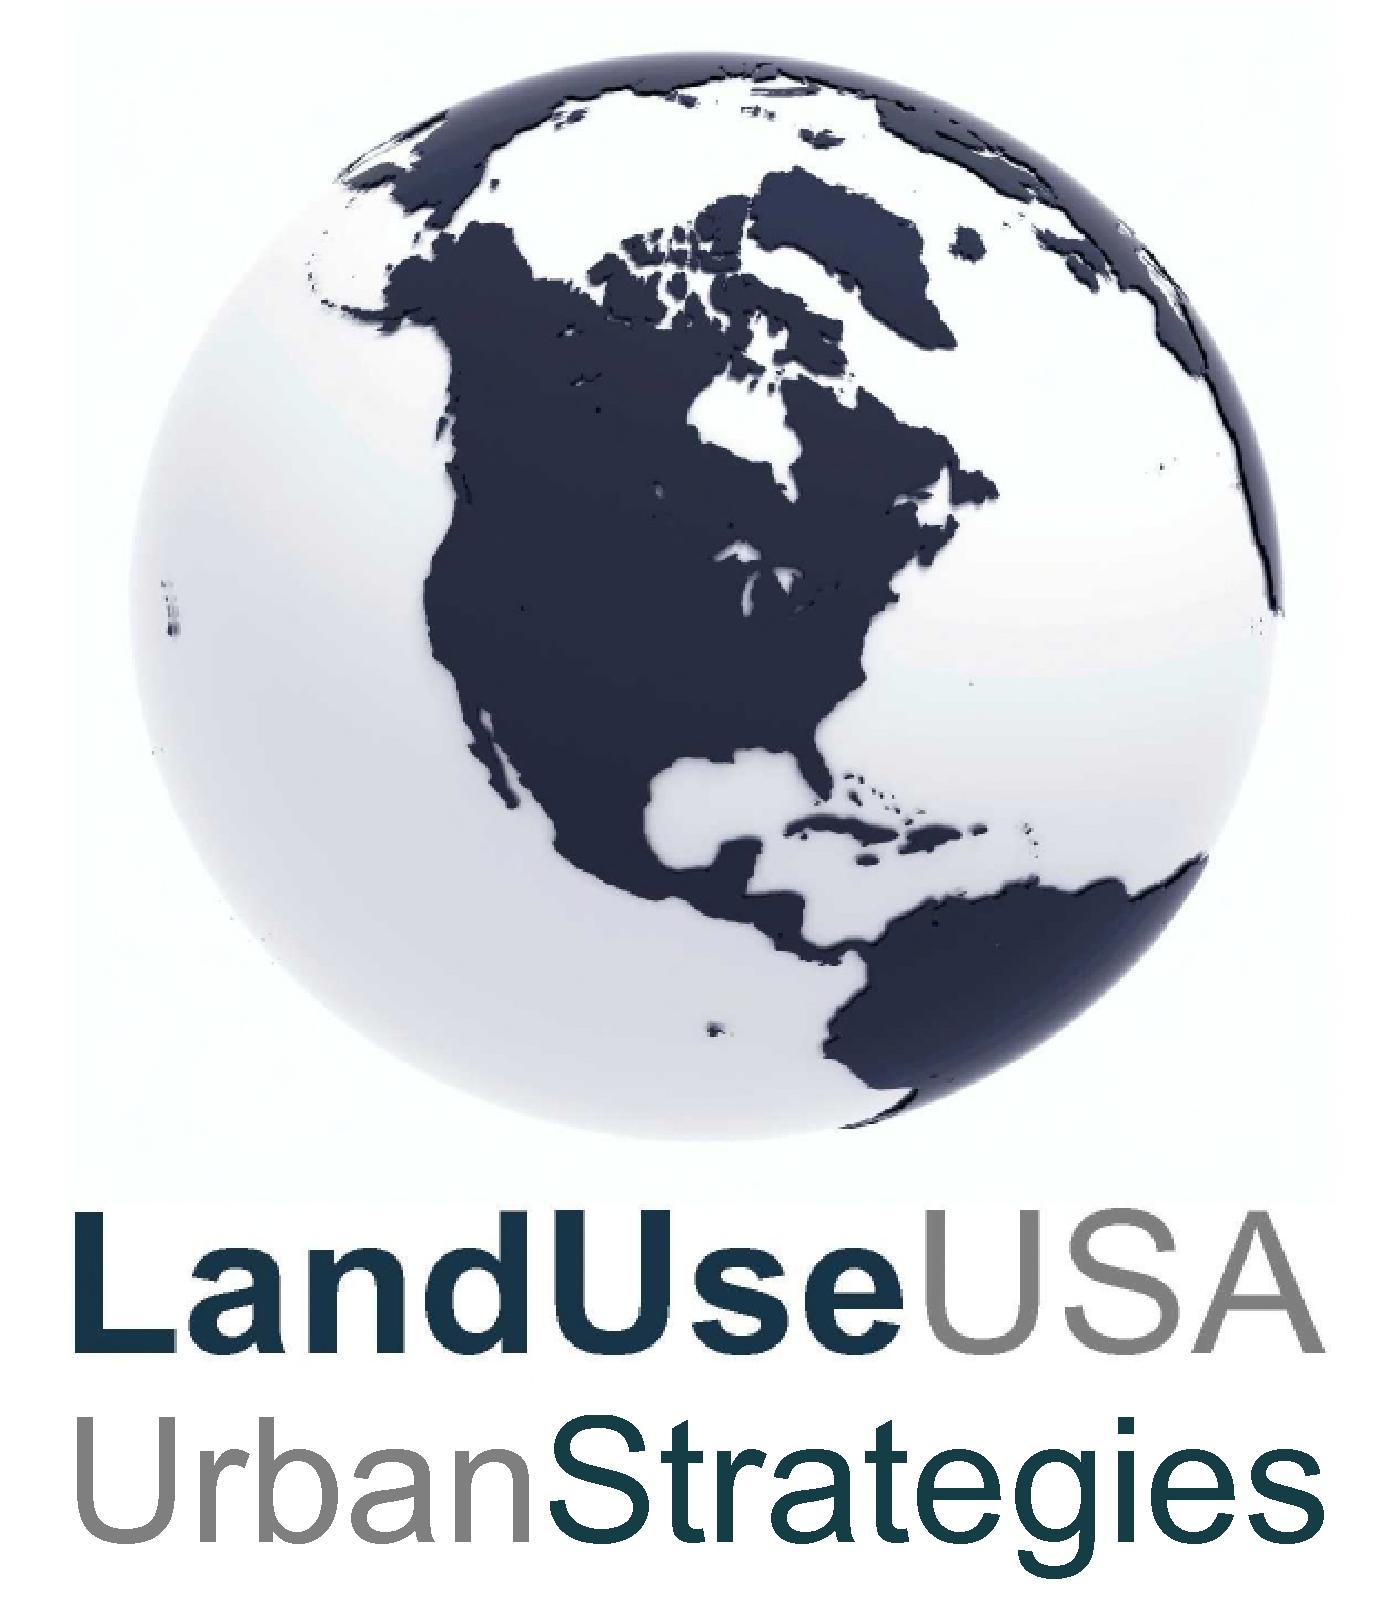 www.LandUseUSA.com